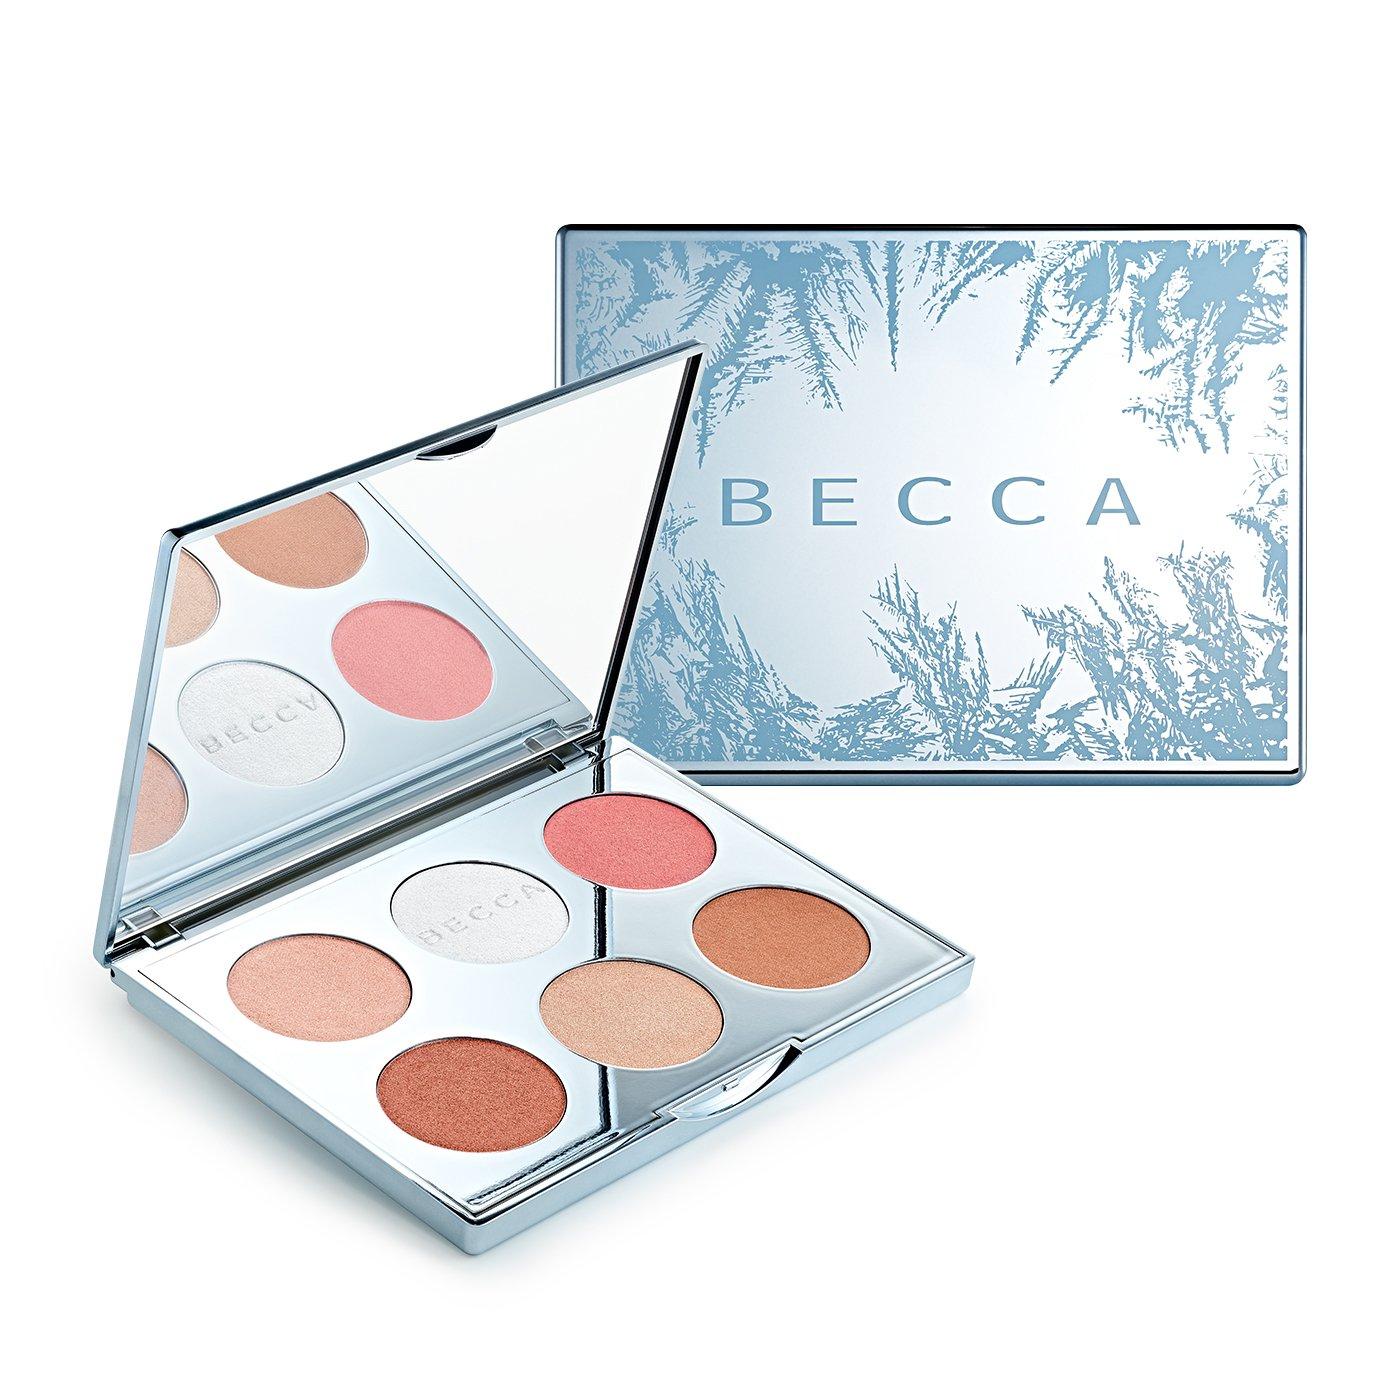 Amazon.com: Becca Apres Ski Glow Face Palette - 6 x 0.09 oz: Beauty